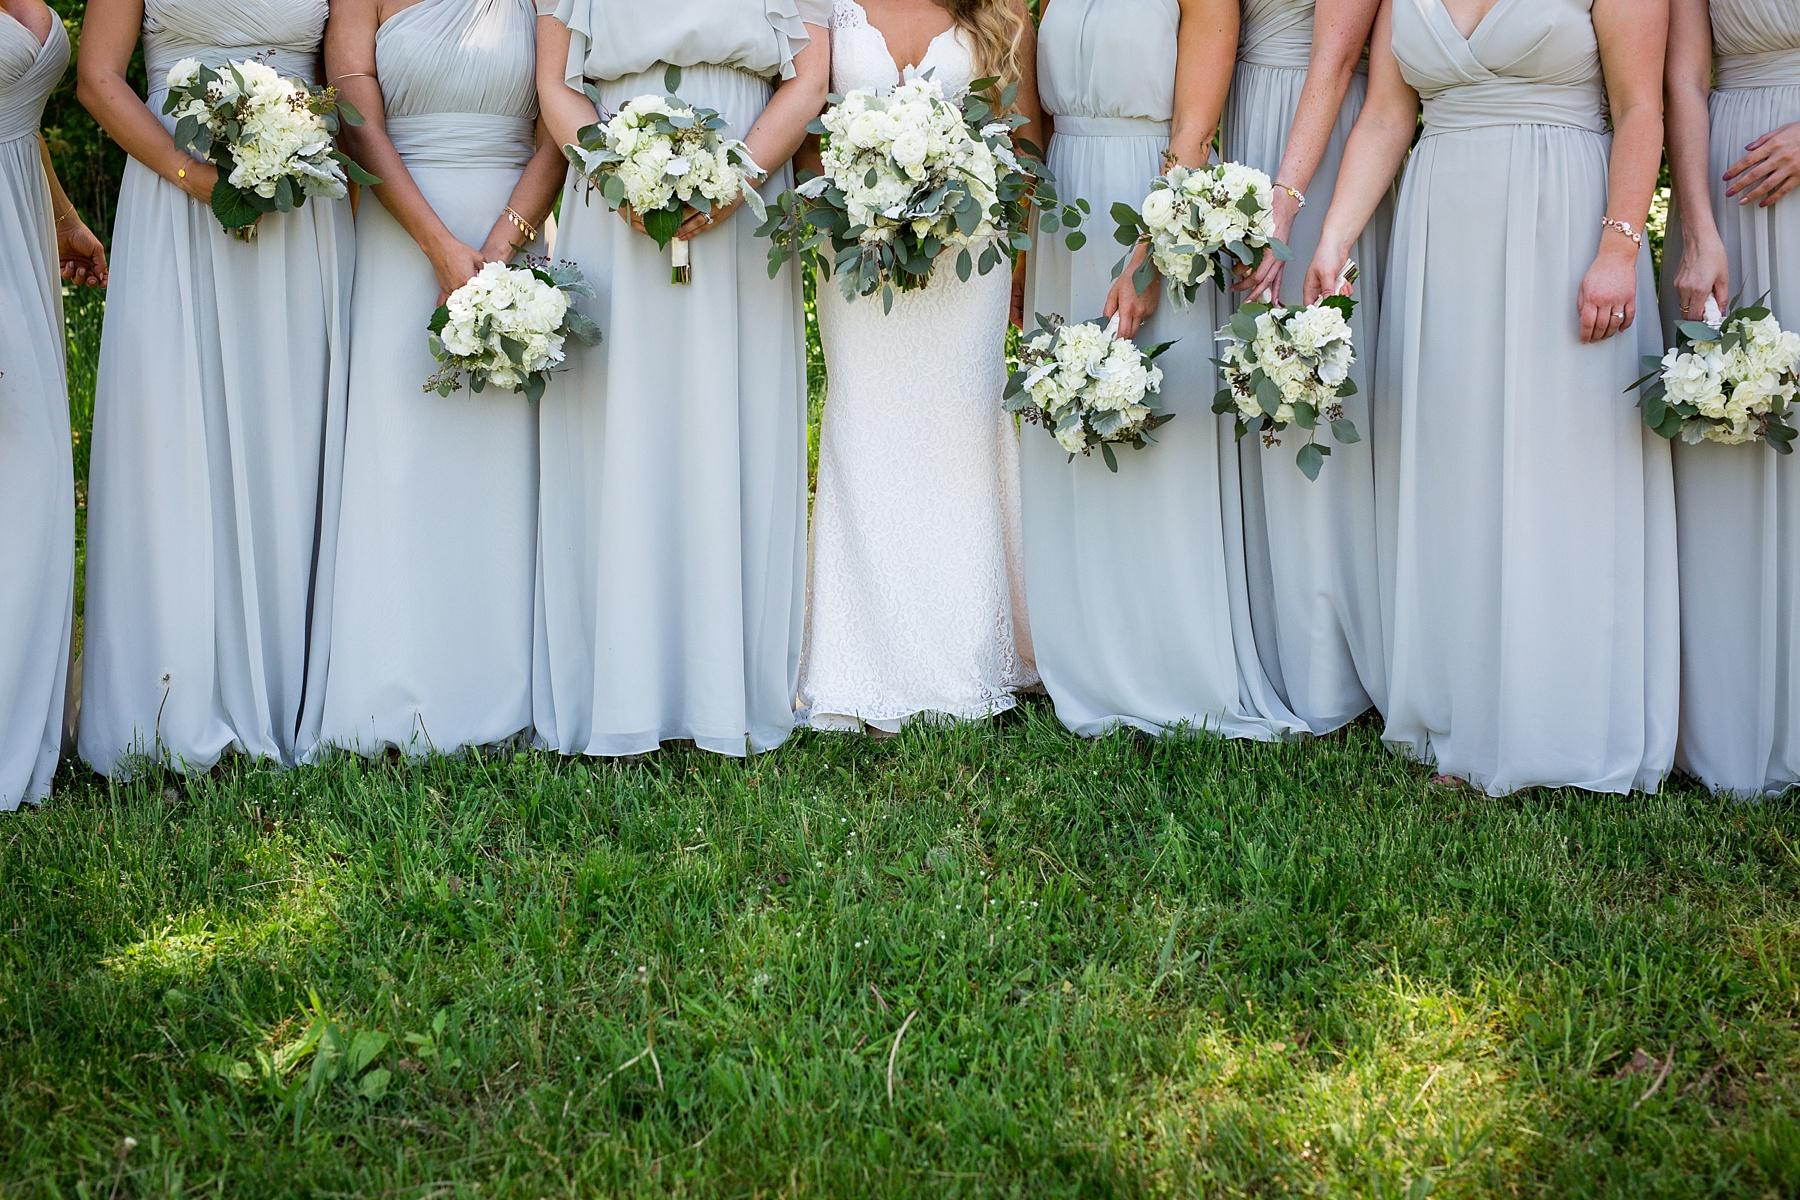 Brandon_Shafer_Photography_Kara_Doug_12_corners_Wedding_Benton_Harbor_0024.jpg